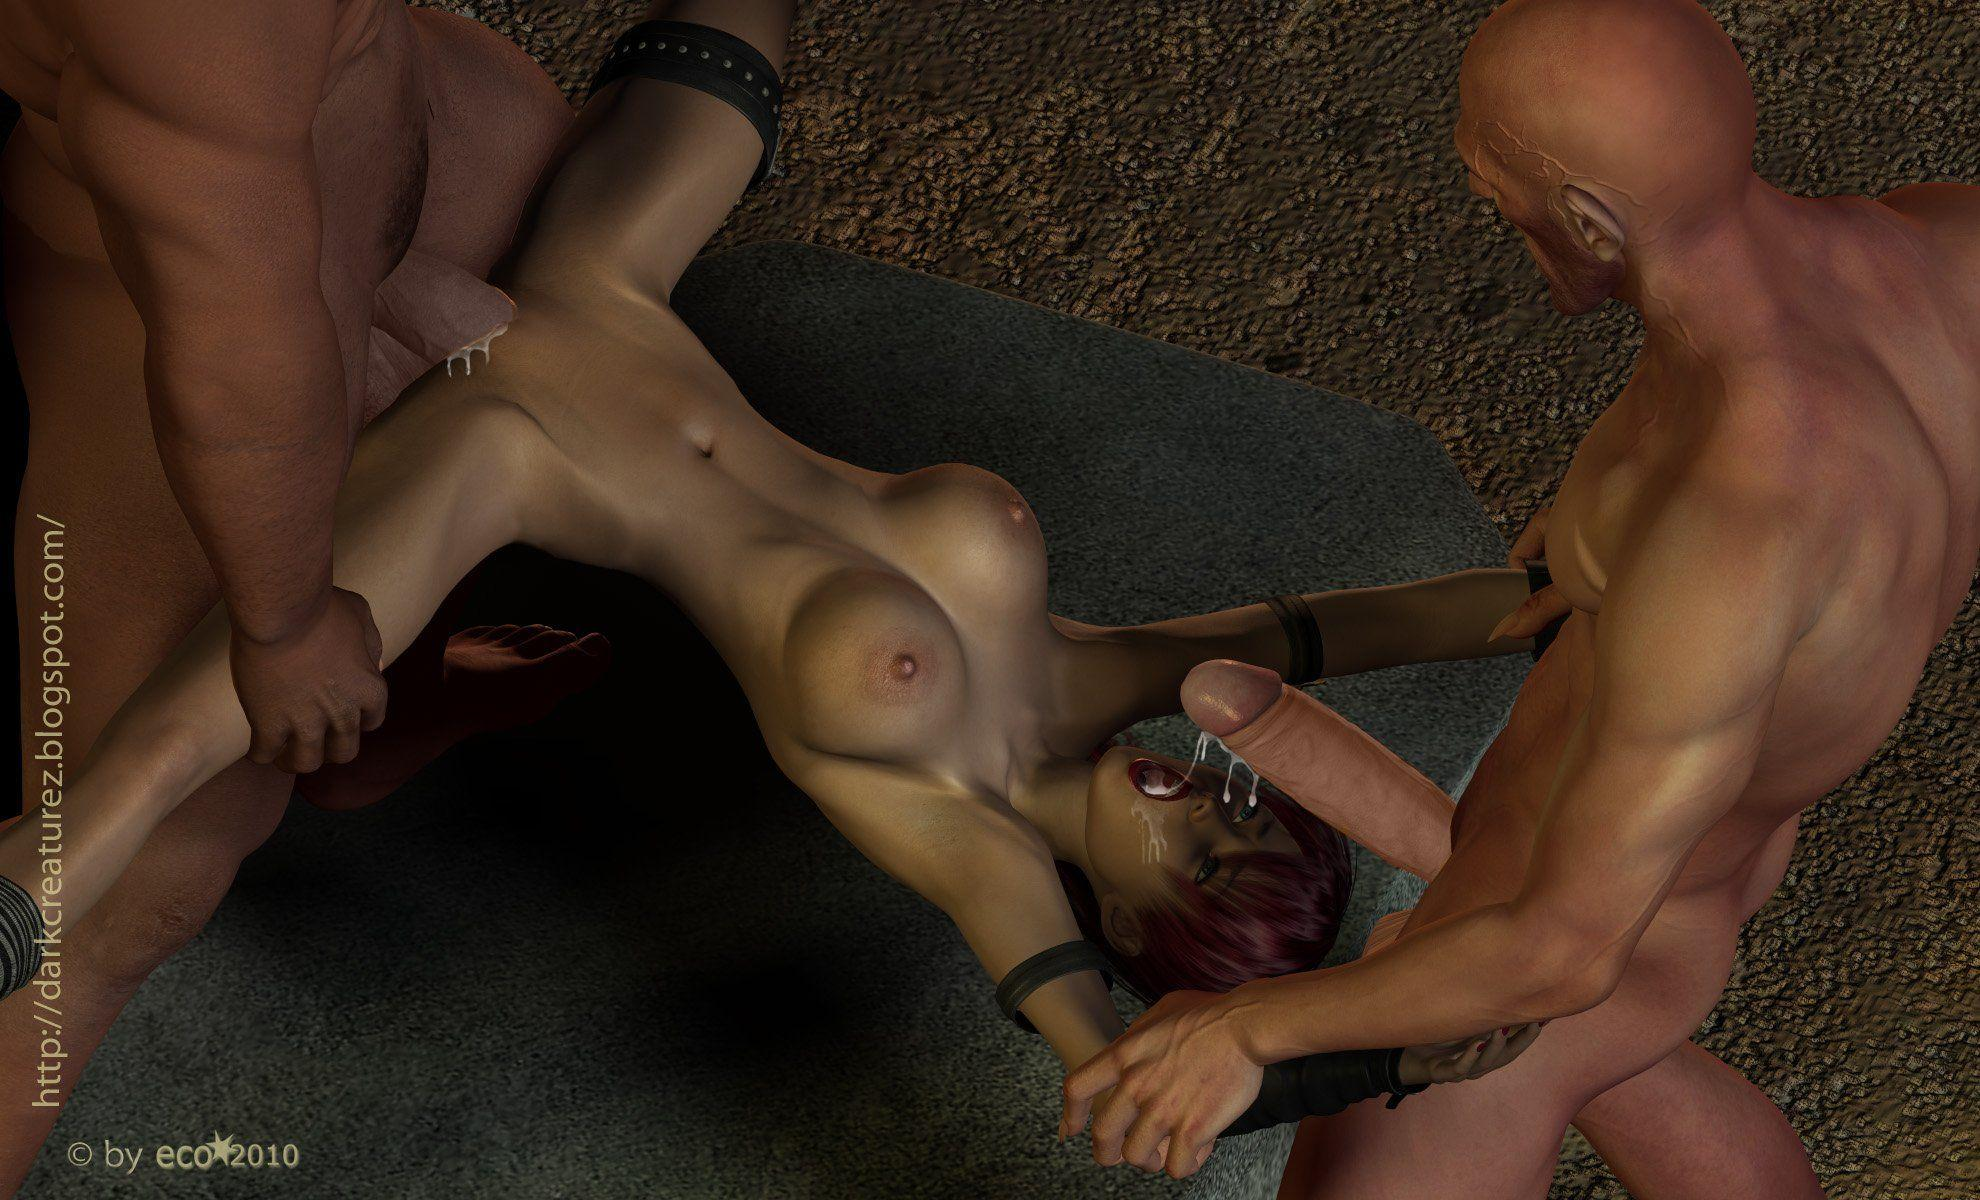 Porn star katie morgan naked